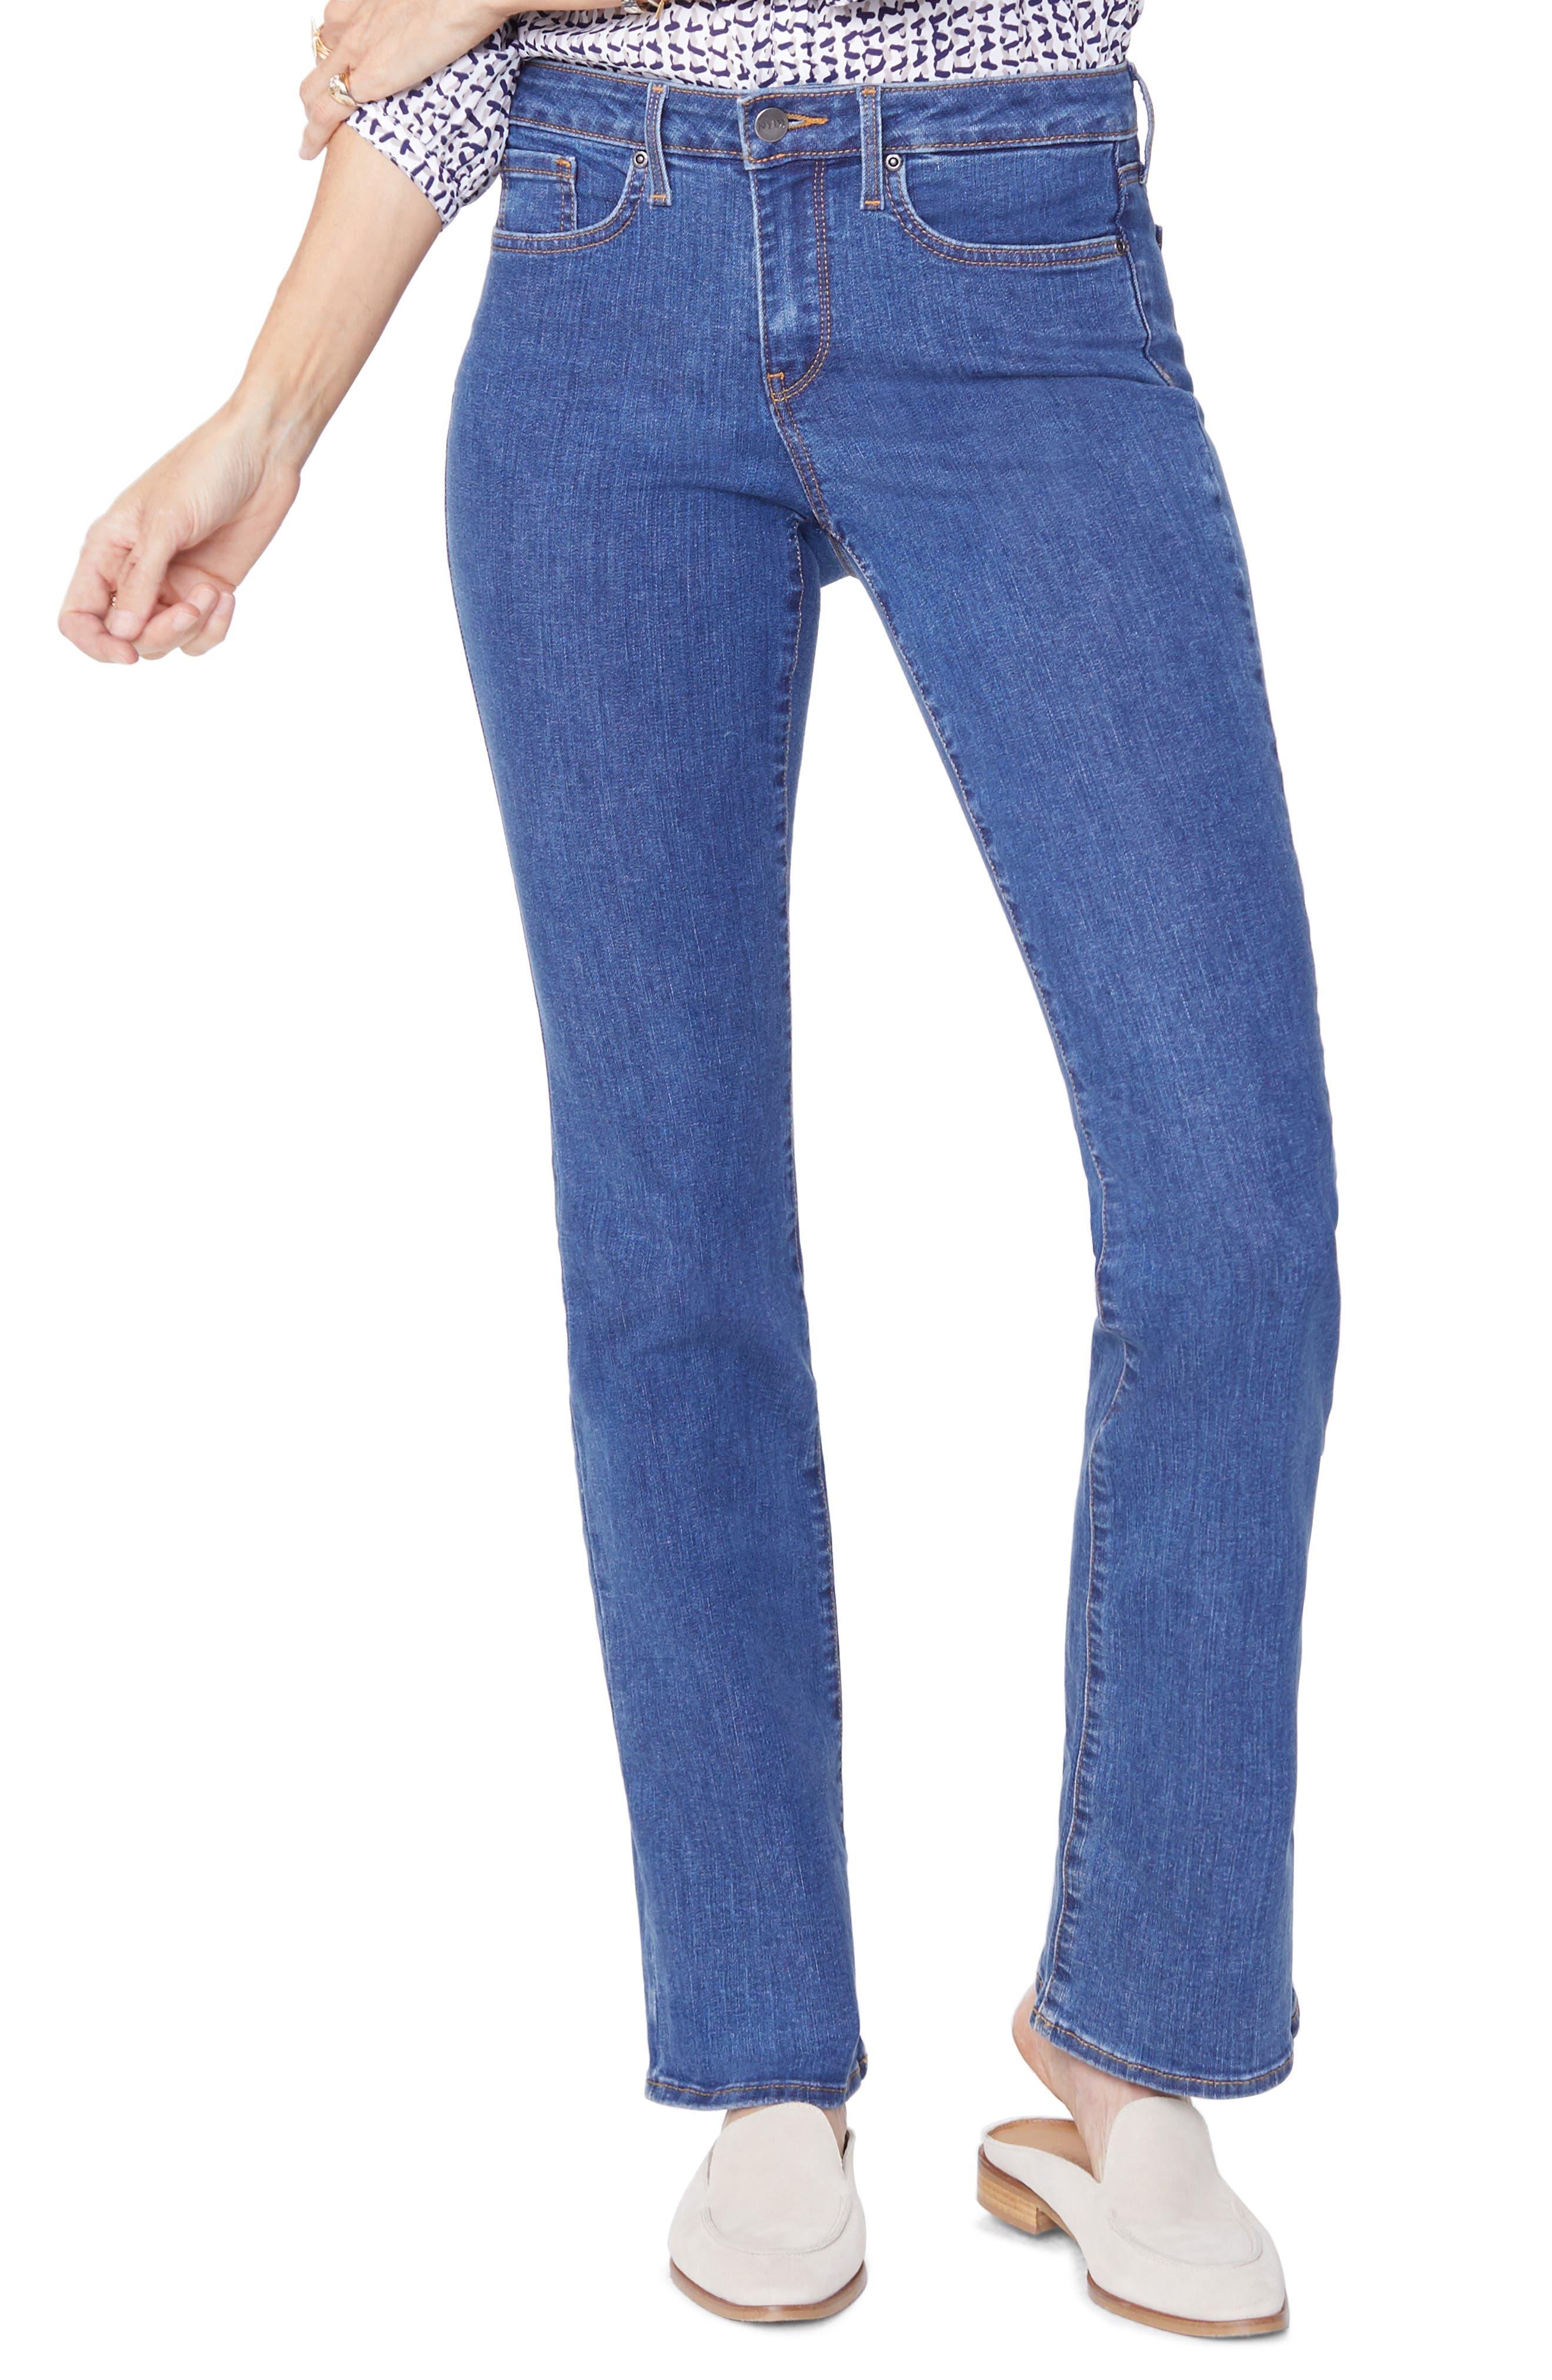 NYDJ Barbara Stretch Bootcut Jeans, Main, color, BATIK BLUE